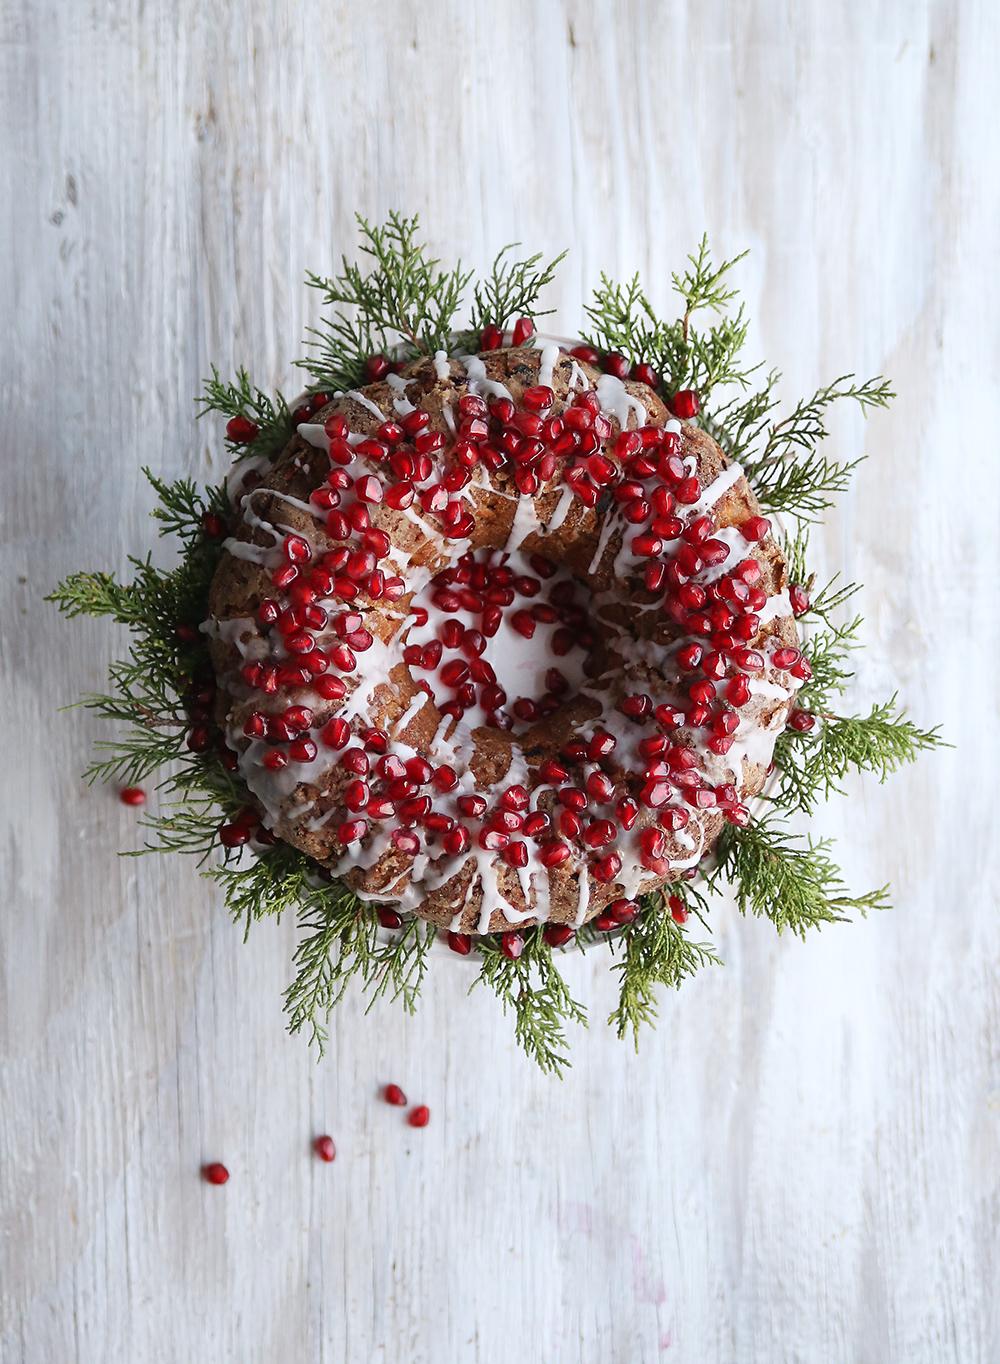 IMG_0632-Gluten-free-Vegan-Apple-Cranberry-Bundt-Cake6